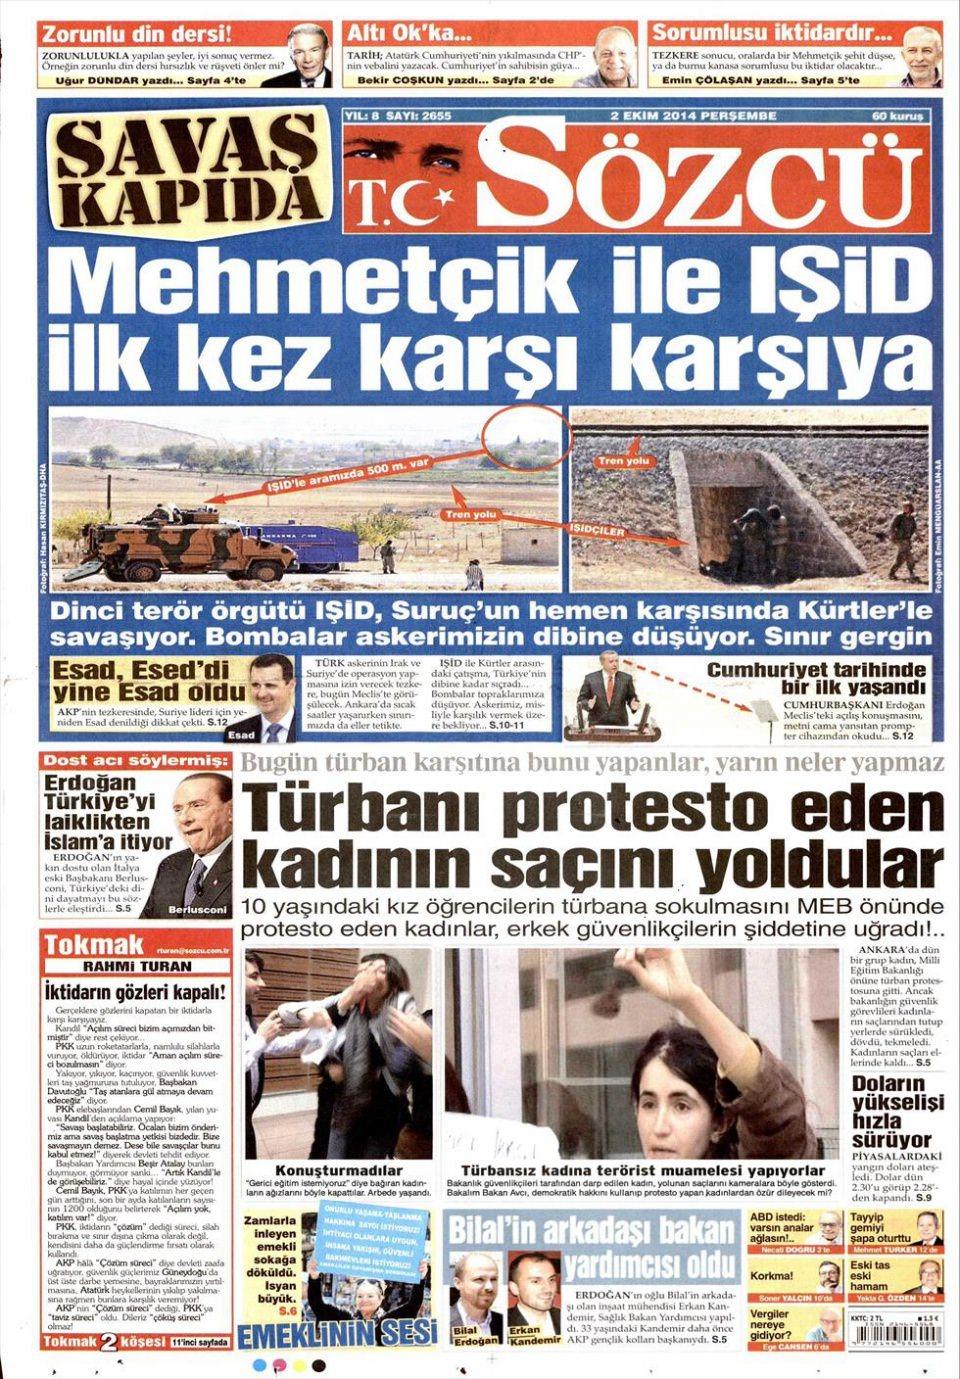 2 Ekim 2014 gazete manşetleri 16